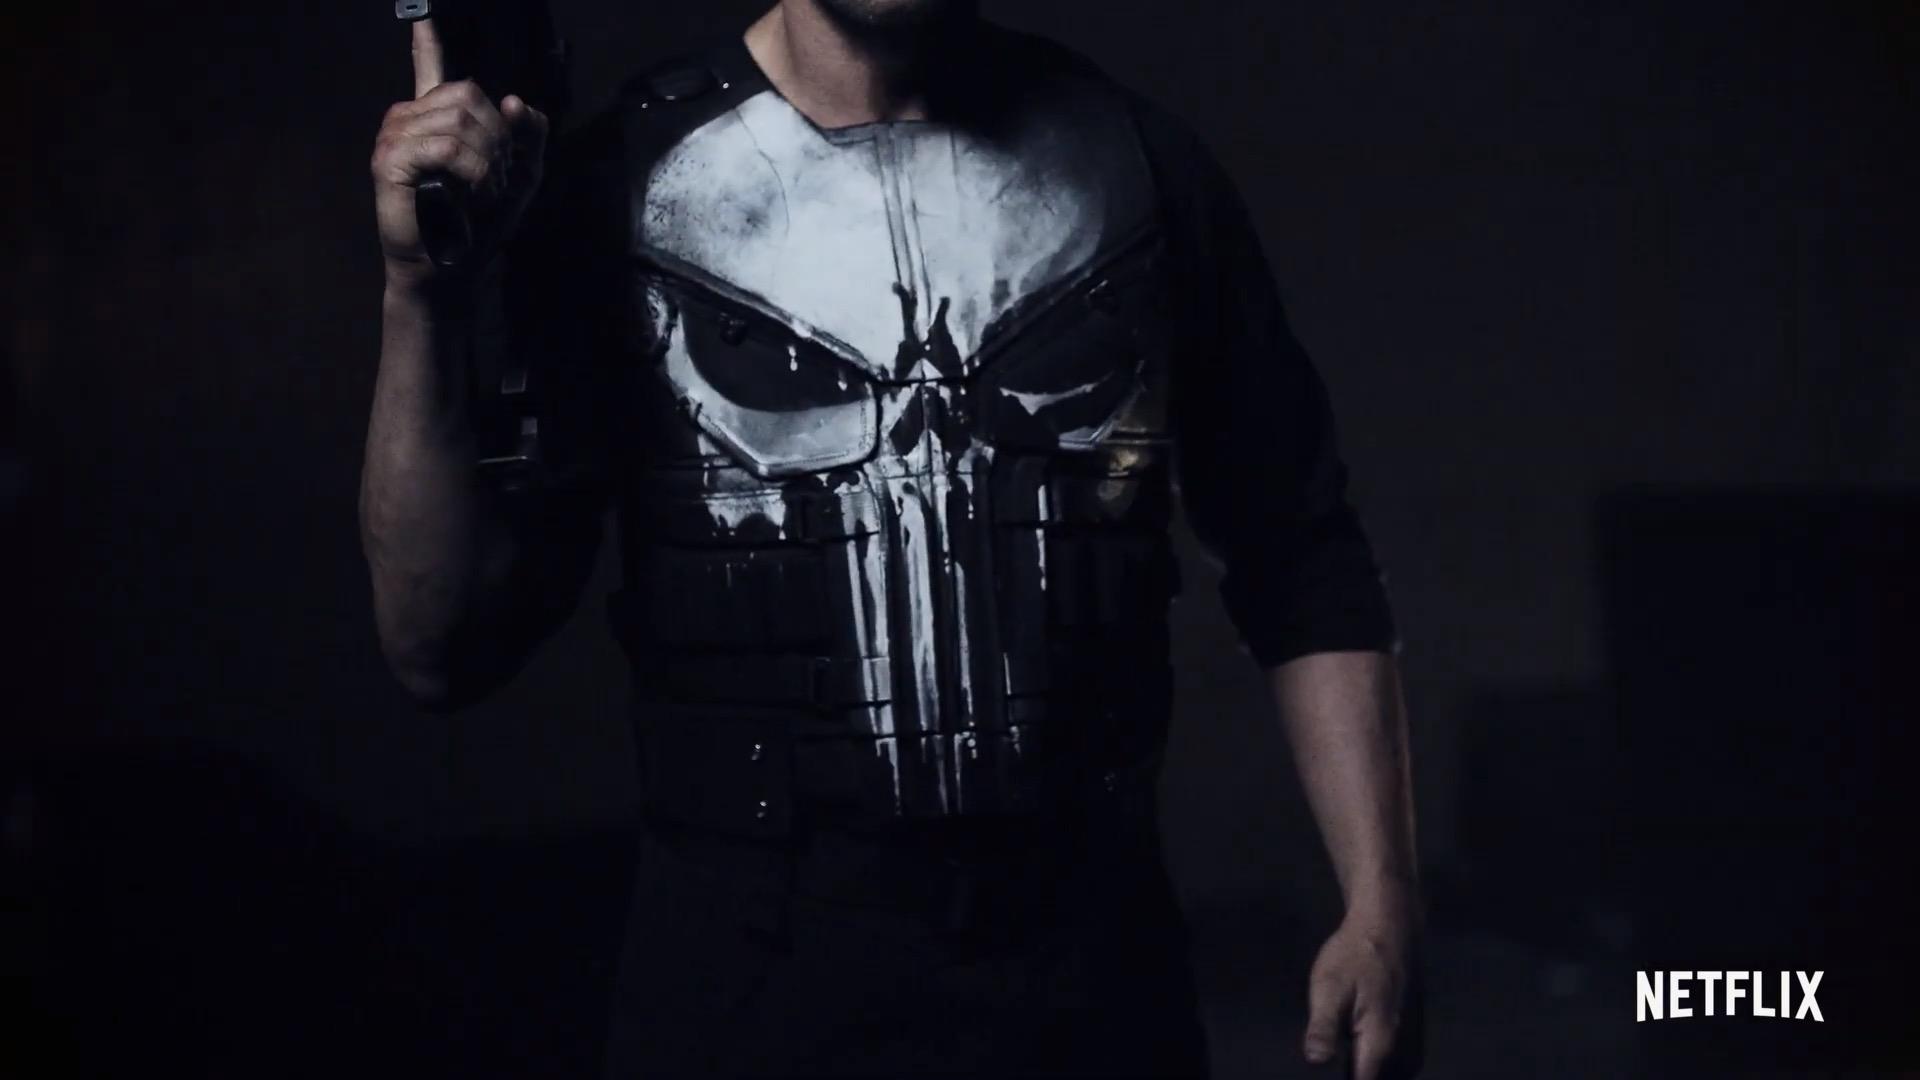 99 Netflix Thunderbolts Punisher Hd Wallpaper Background Image The